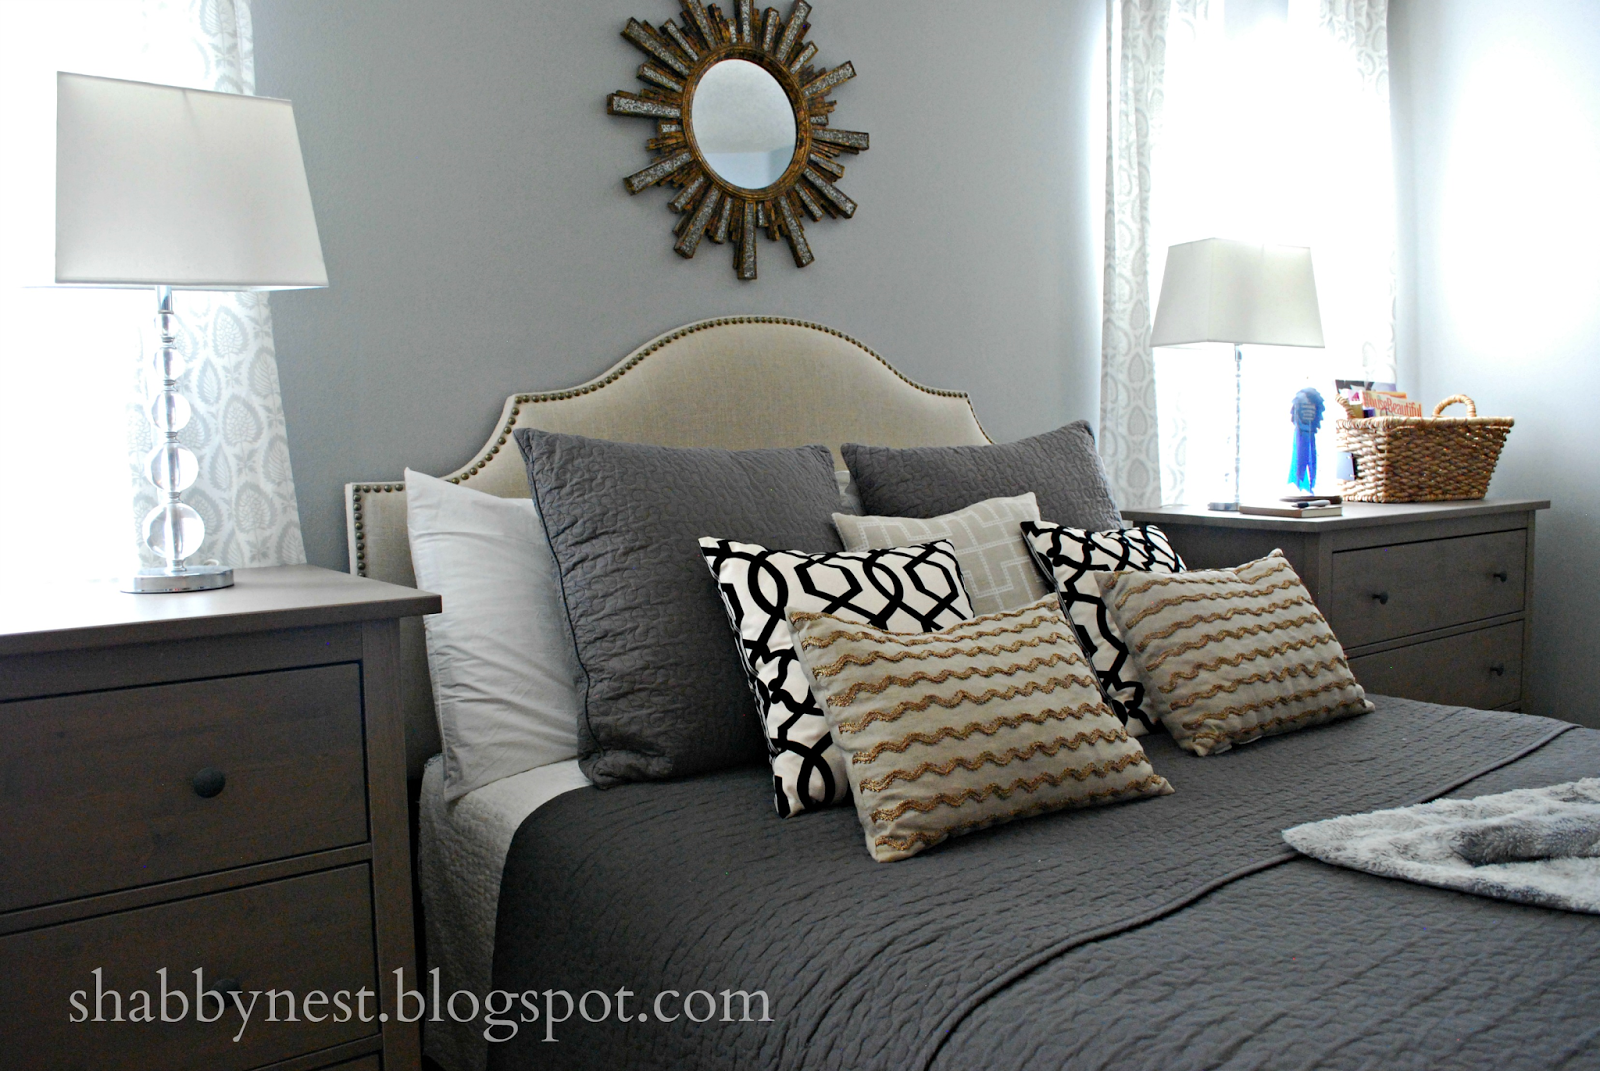 Hemnes, Ikea and Beds on Pinterest